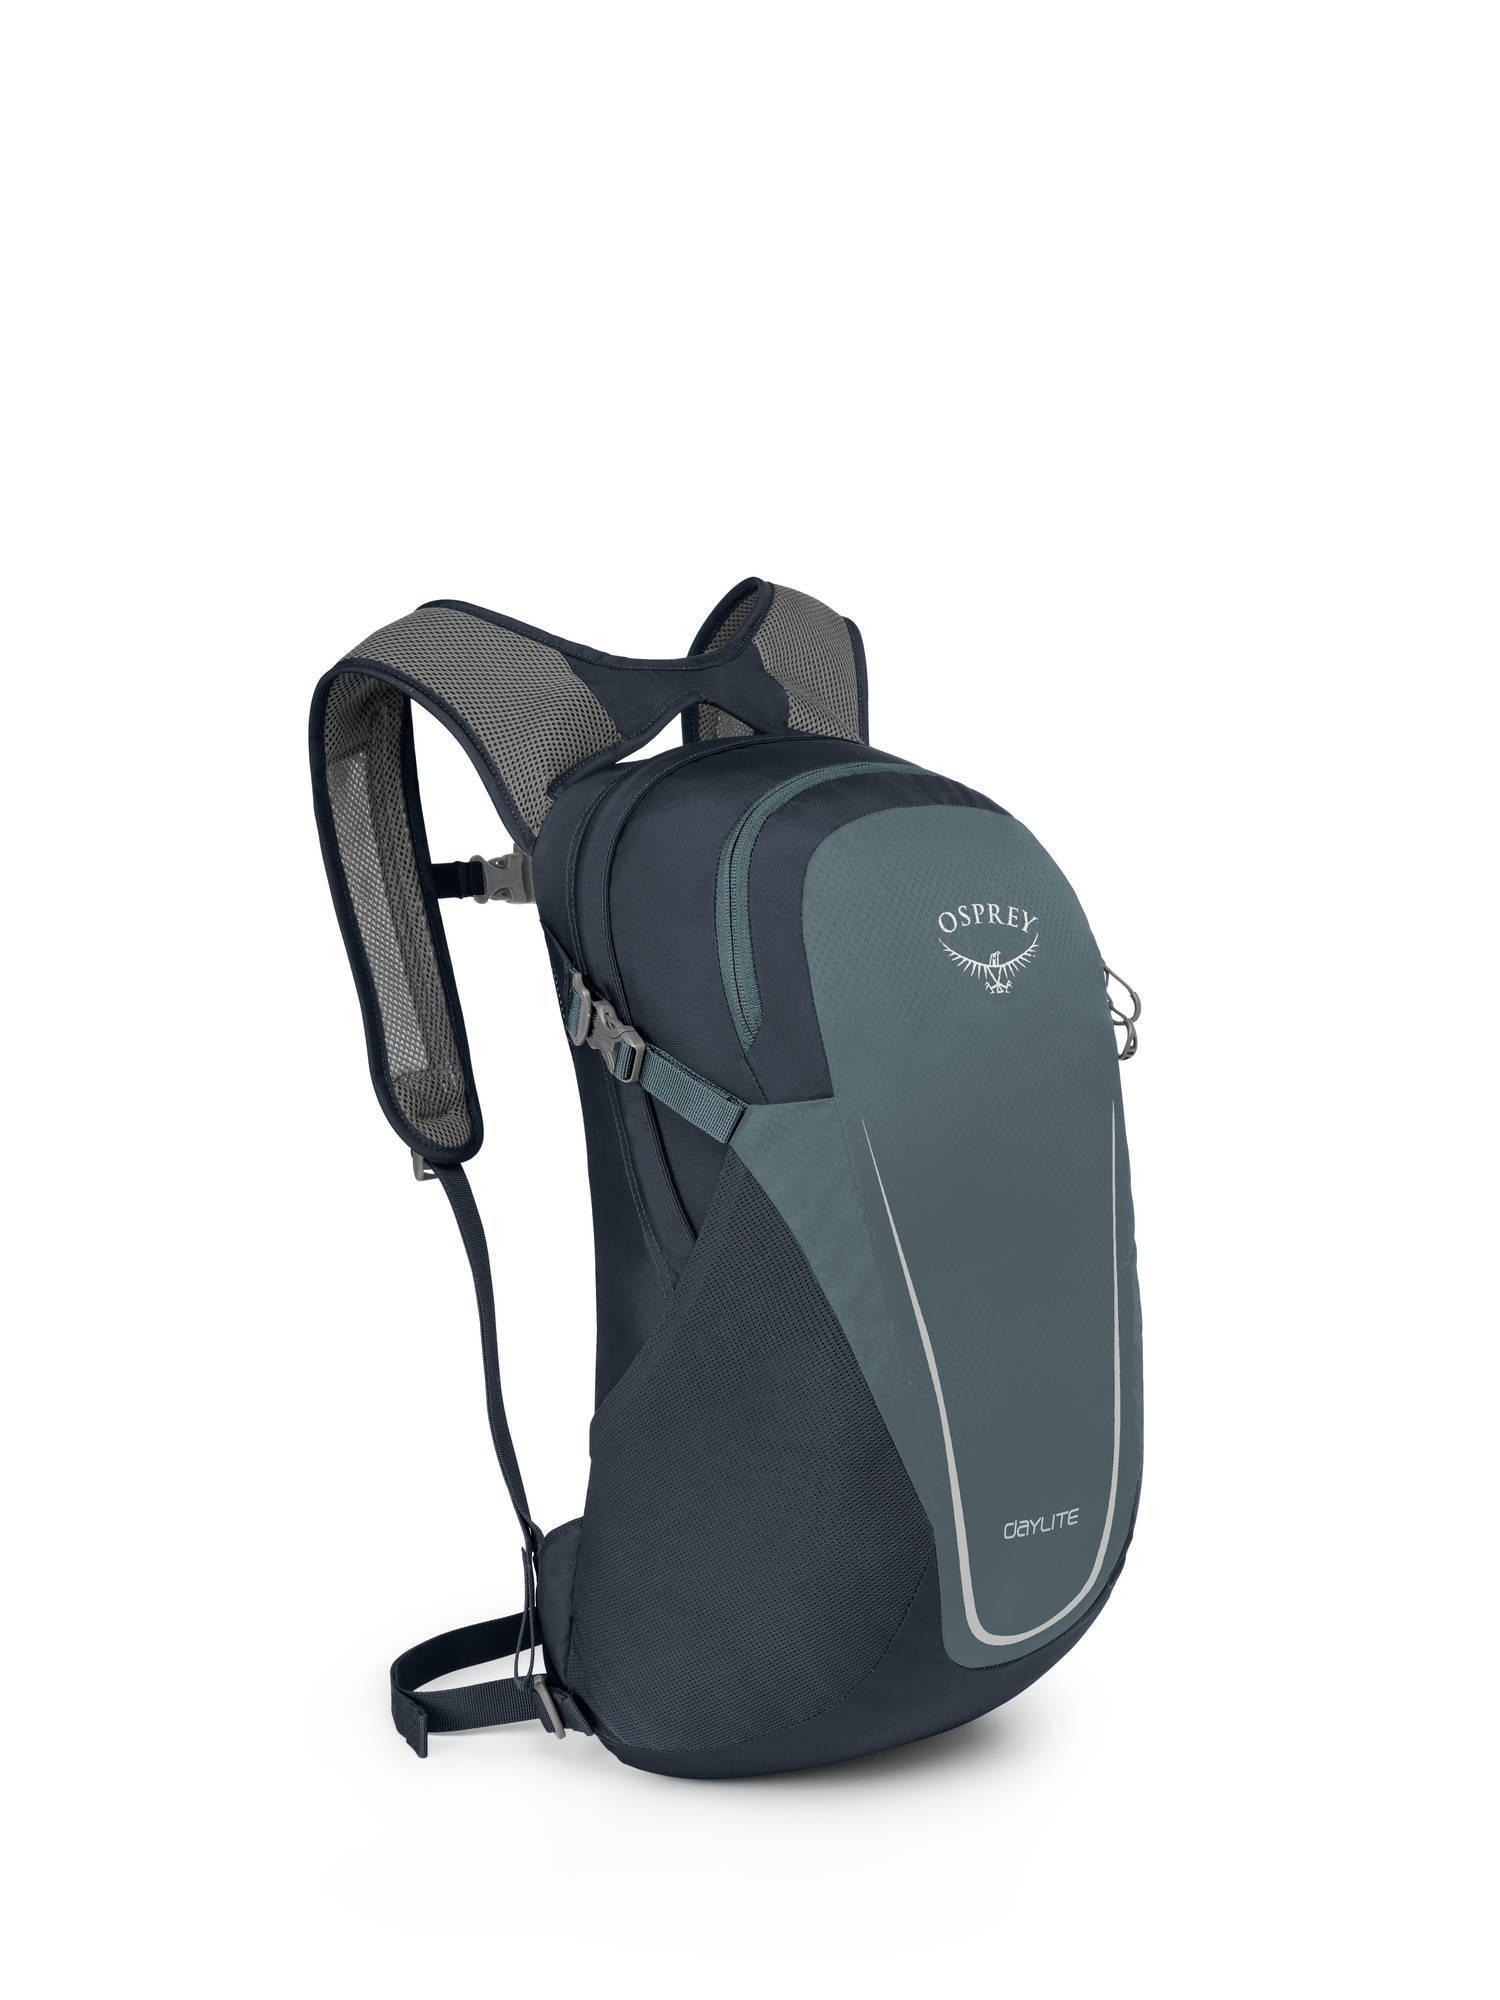 Городские рюкзаки Рюкзак Osprey Daylite Stone Grey Daylite_F17_Side_Stone_Grey_web.jpg